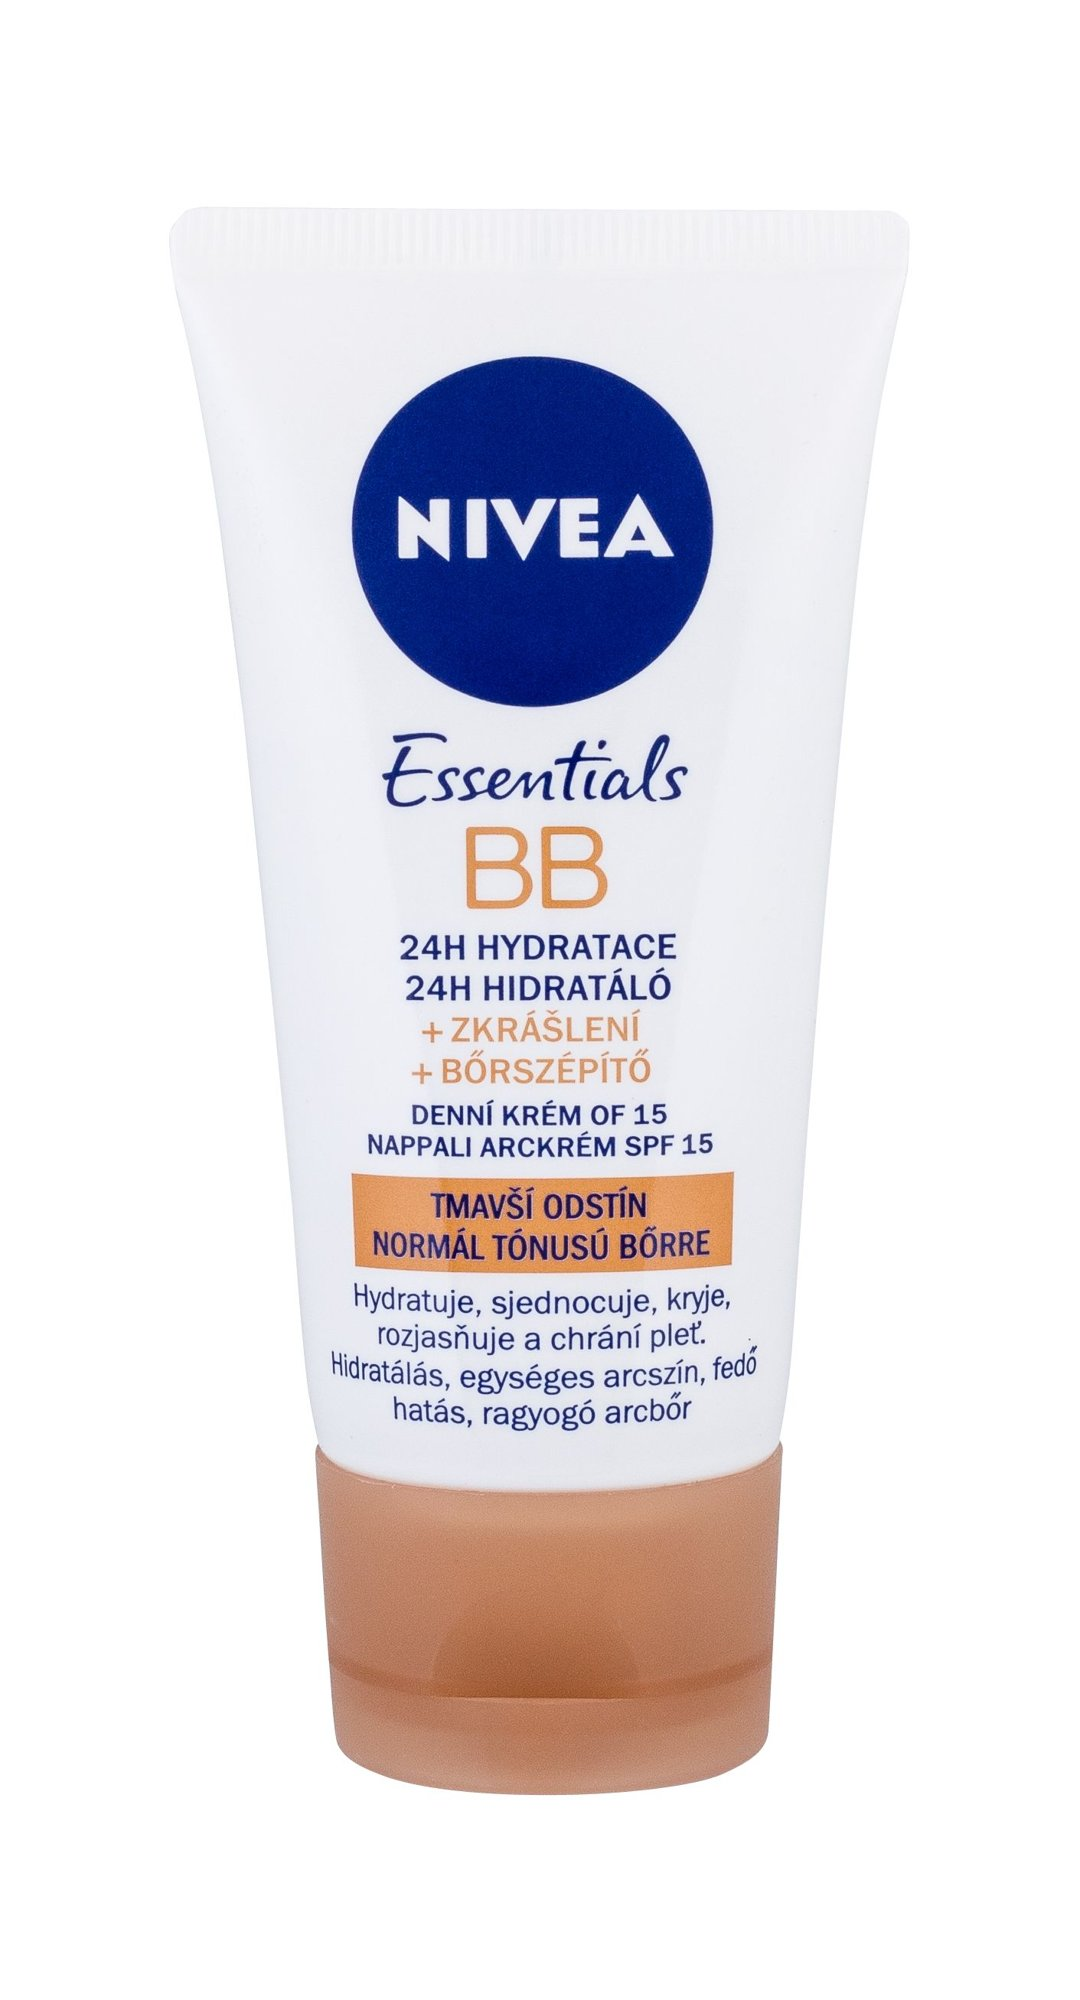 Nivea BB Cream Cosmetic 50ml Medium To Dark